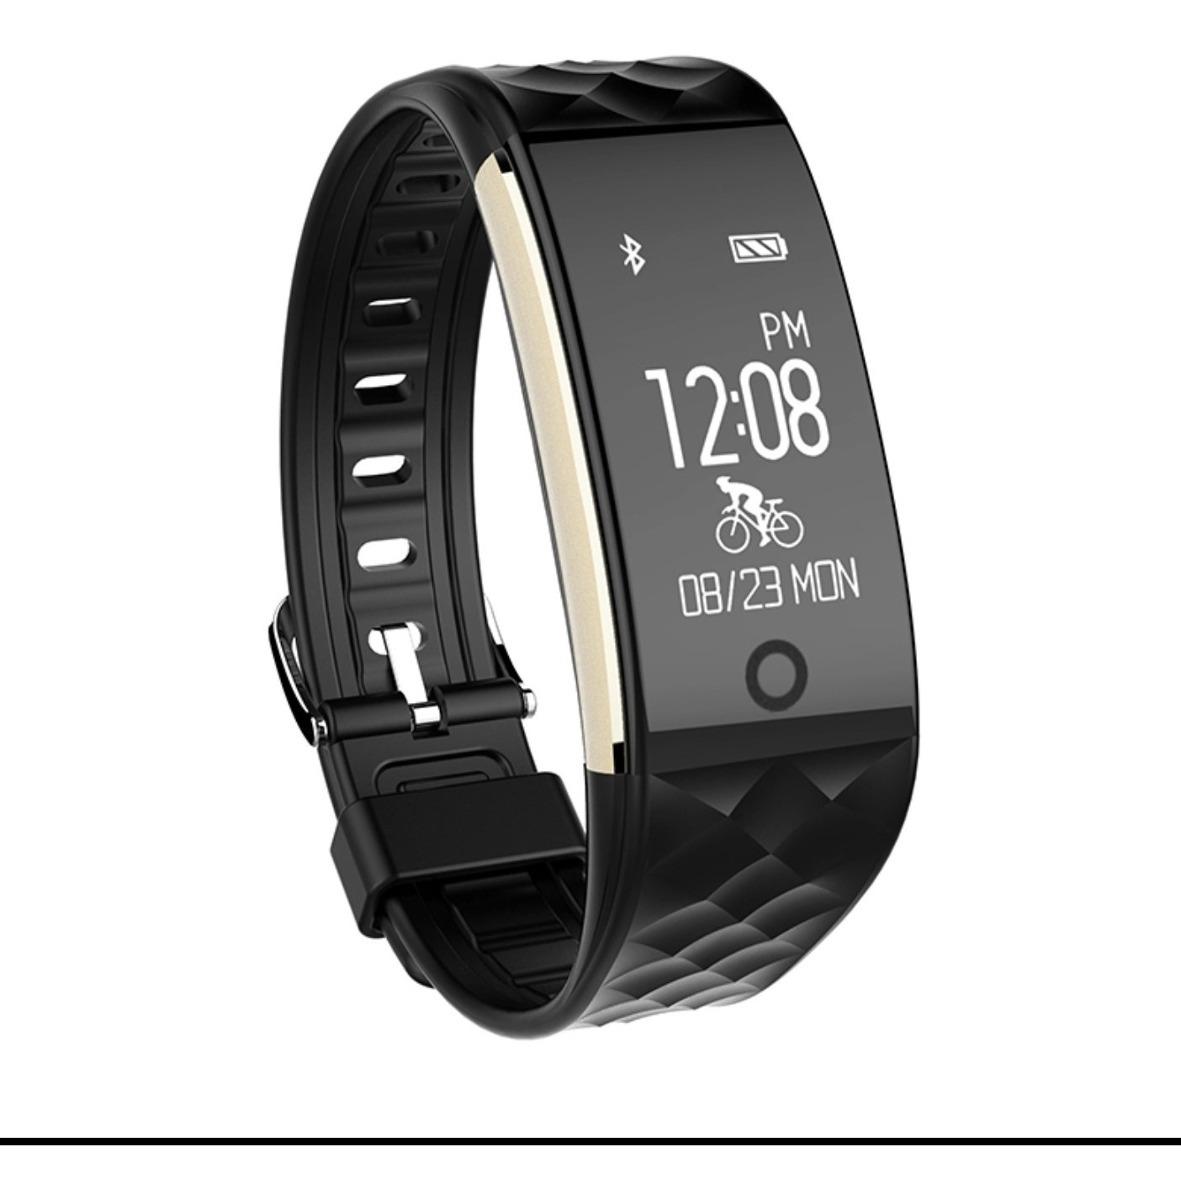 Galaxy Watch Wechat